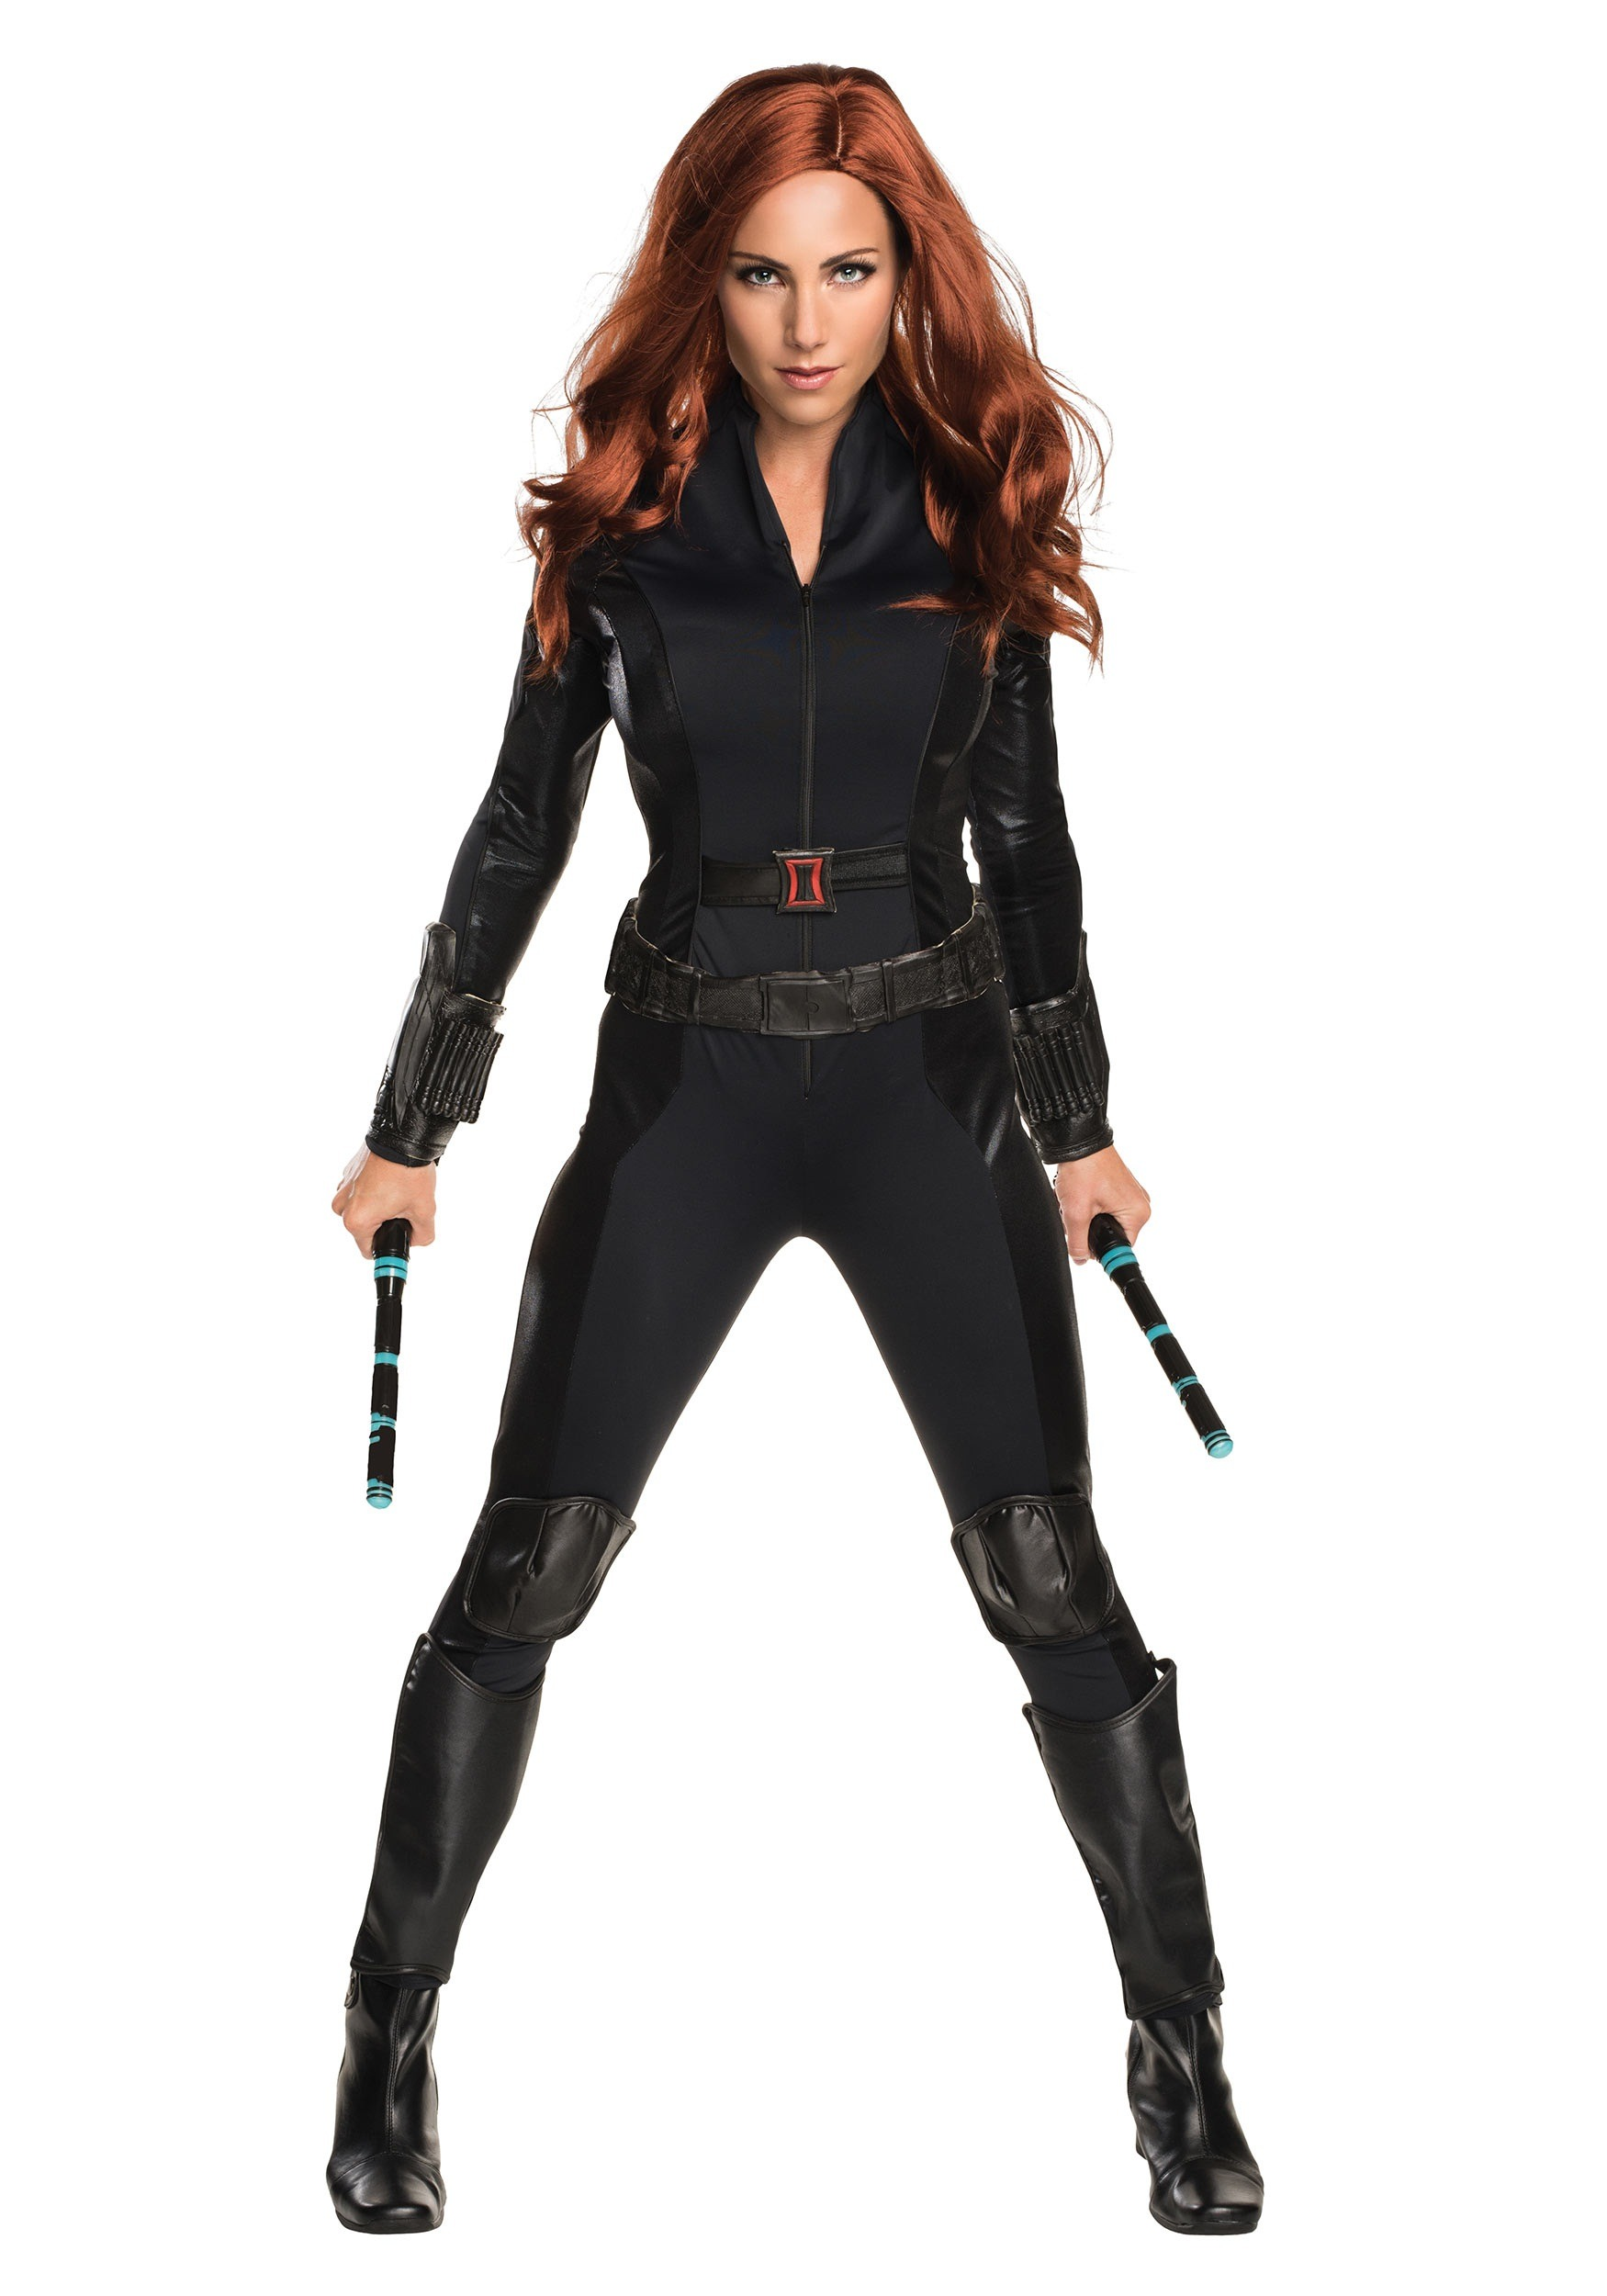 Black Widow wallpapers, Comics, HQ Black Widow pictures | 4K